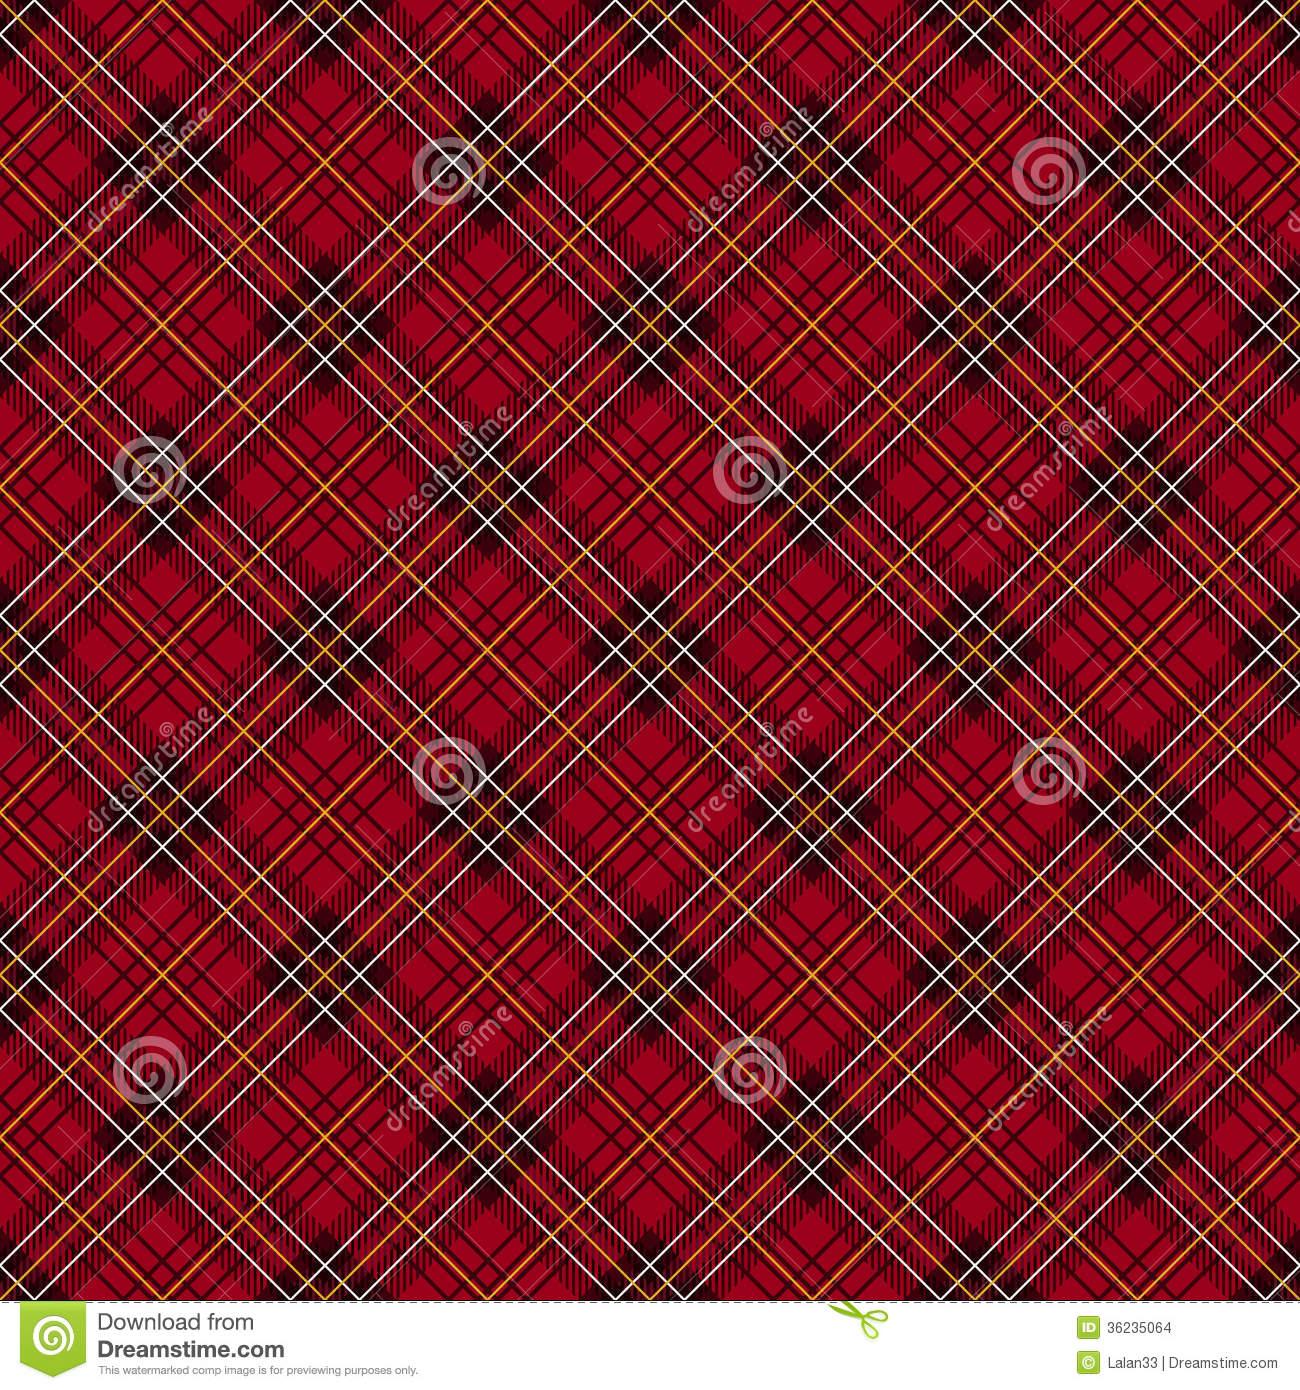 Red plaid wallpaper wallpapersafari for Red check wallpaper